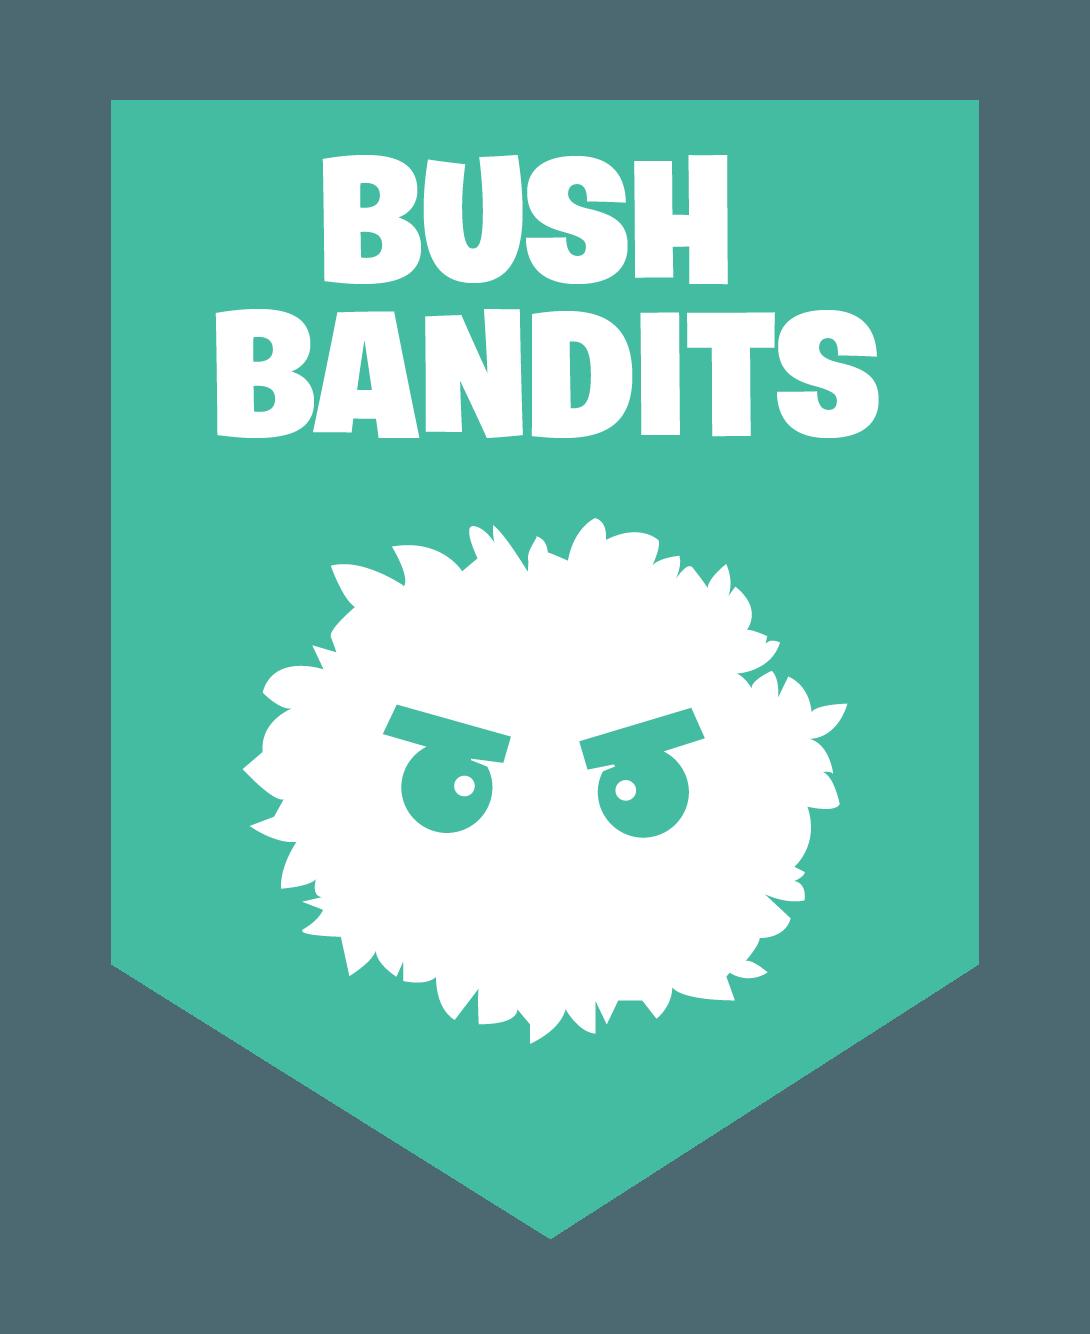 BushBandits.png